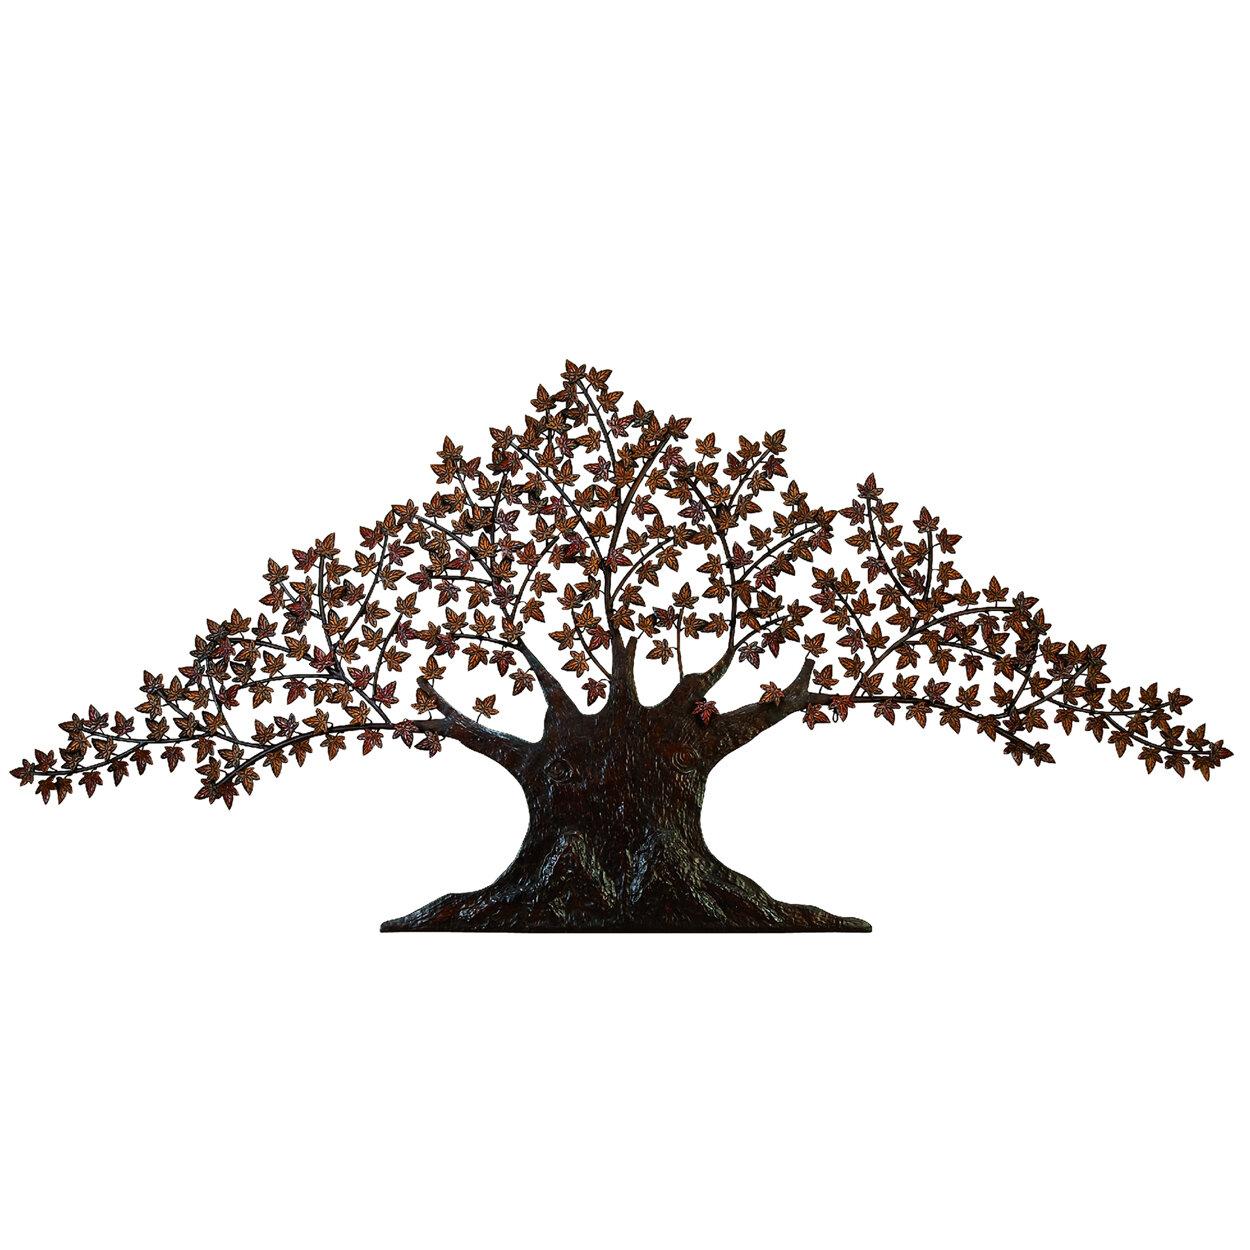 Unique Art Wedding gift Five year anniversary Tree of Life Metal sculpture .Best seller.Live edge Wall Hanging Weld art.